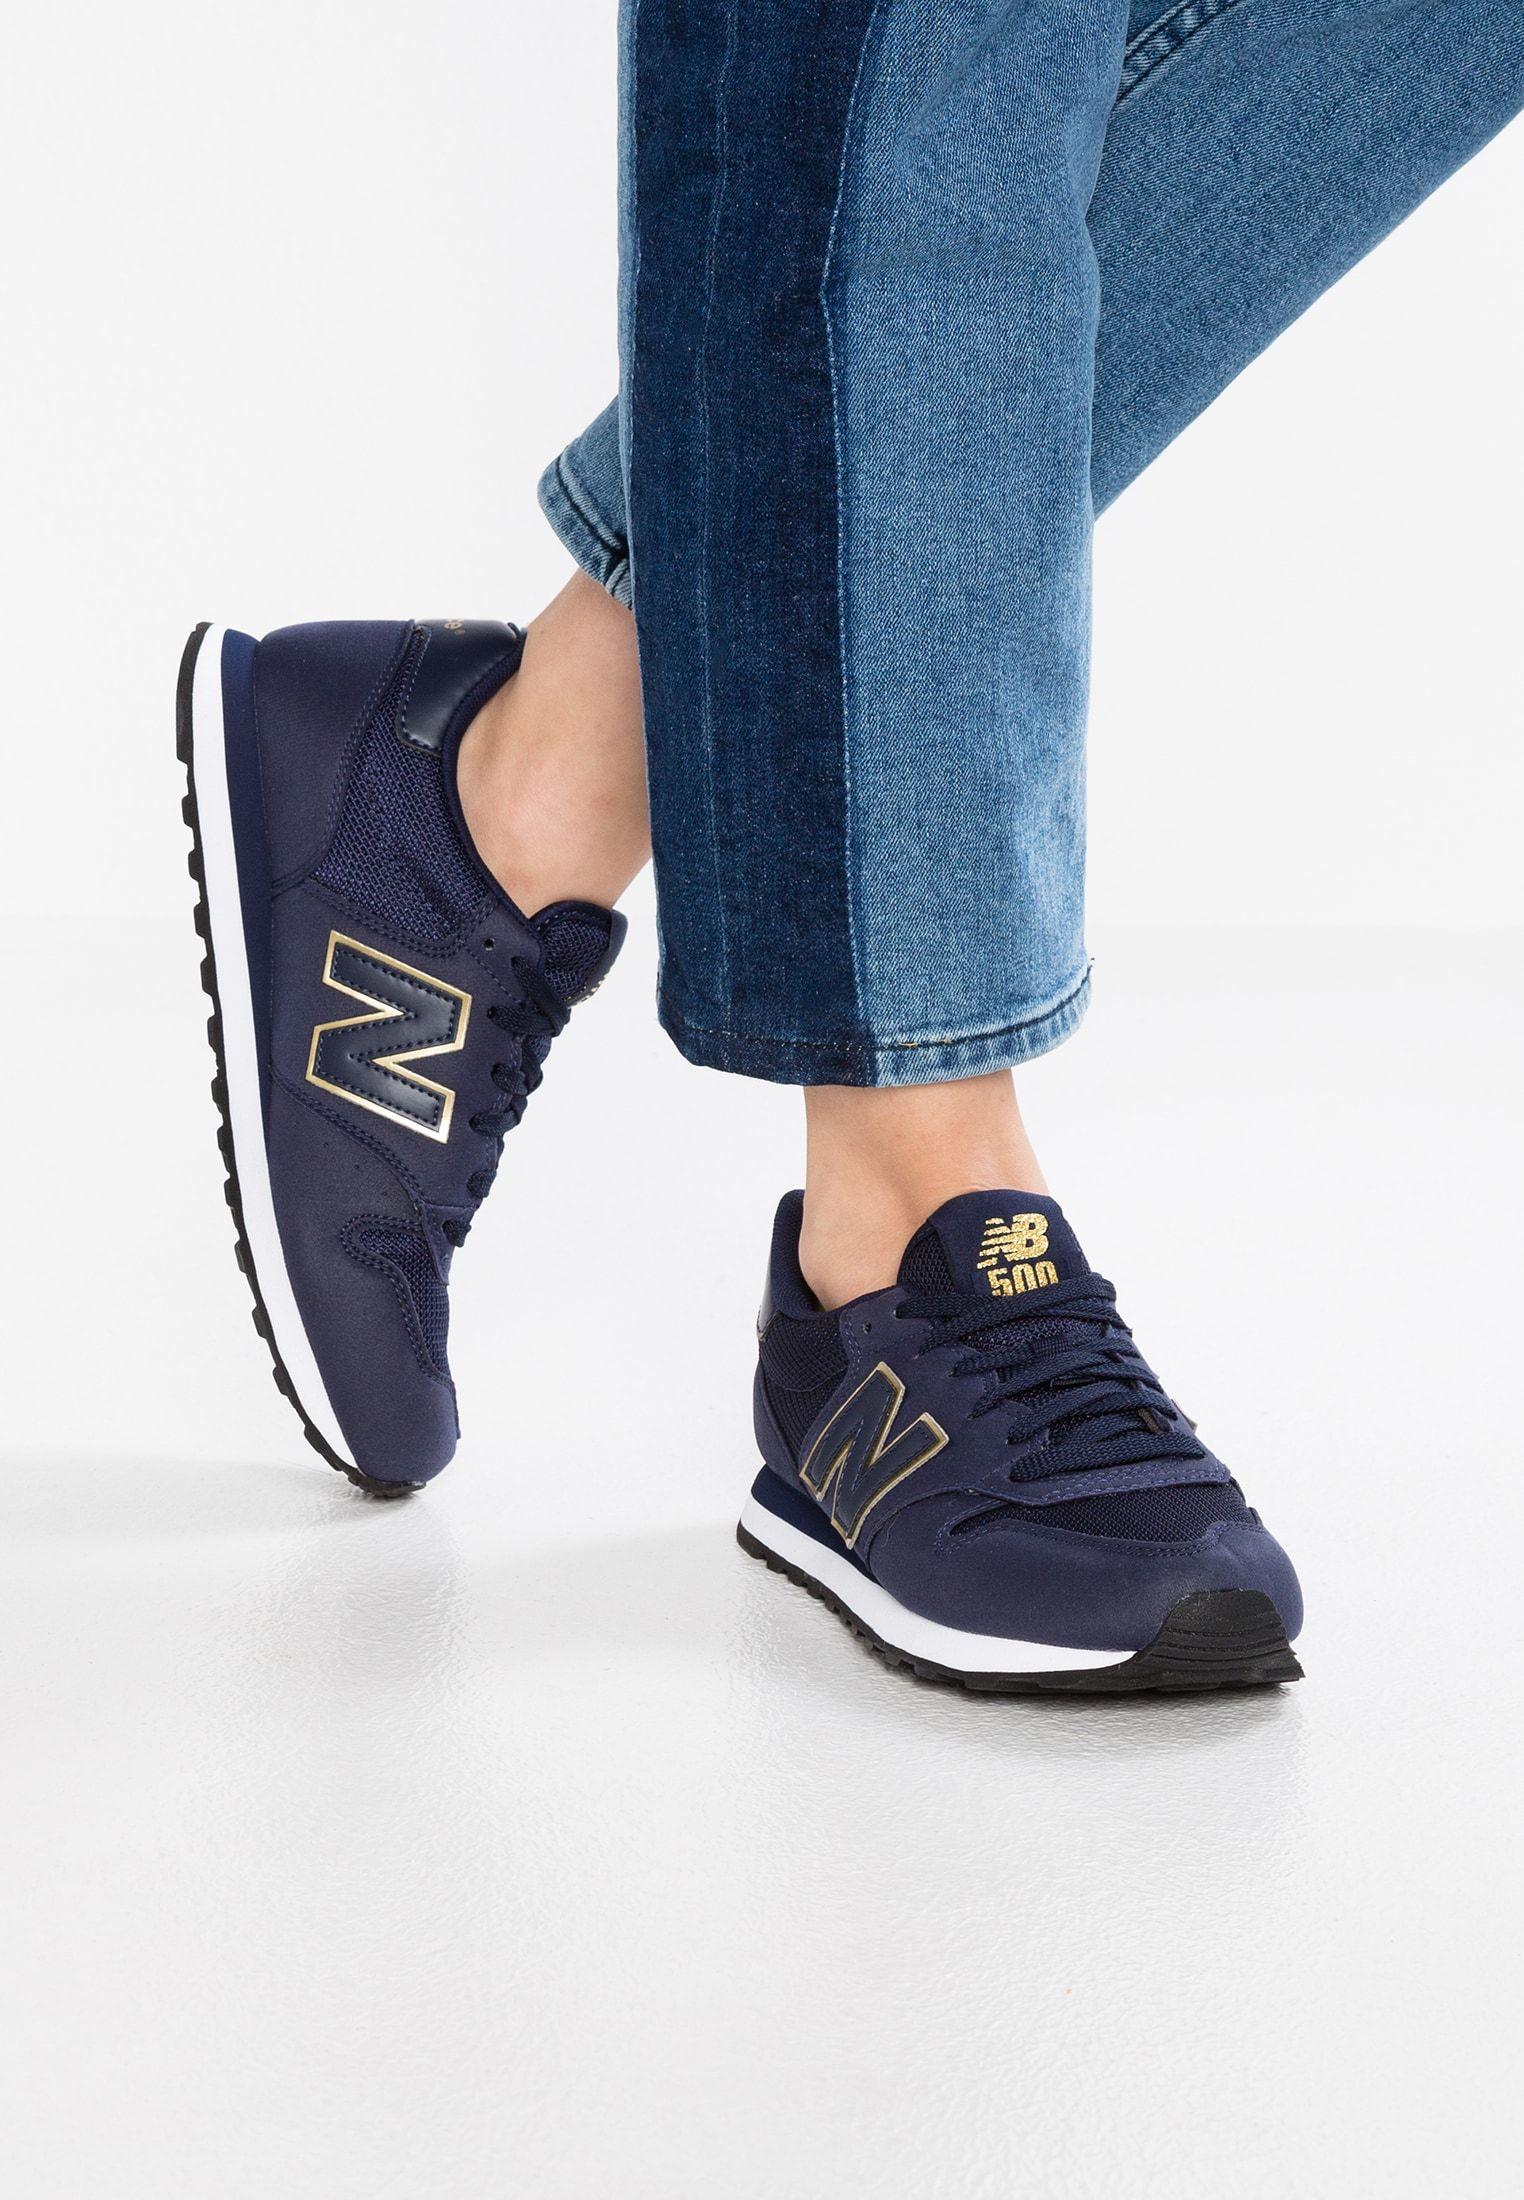 New Balance GW500 - Sneaker low - blue navy/blau - Zalando.de ...